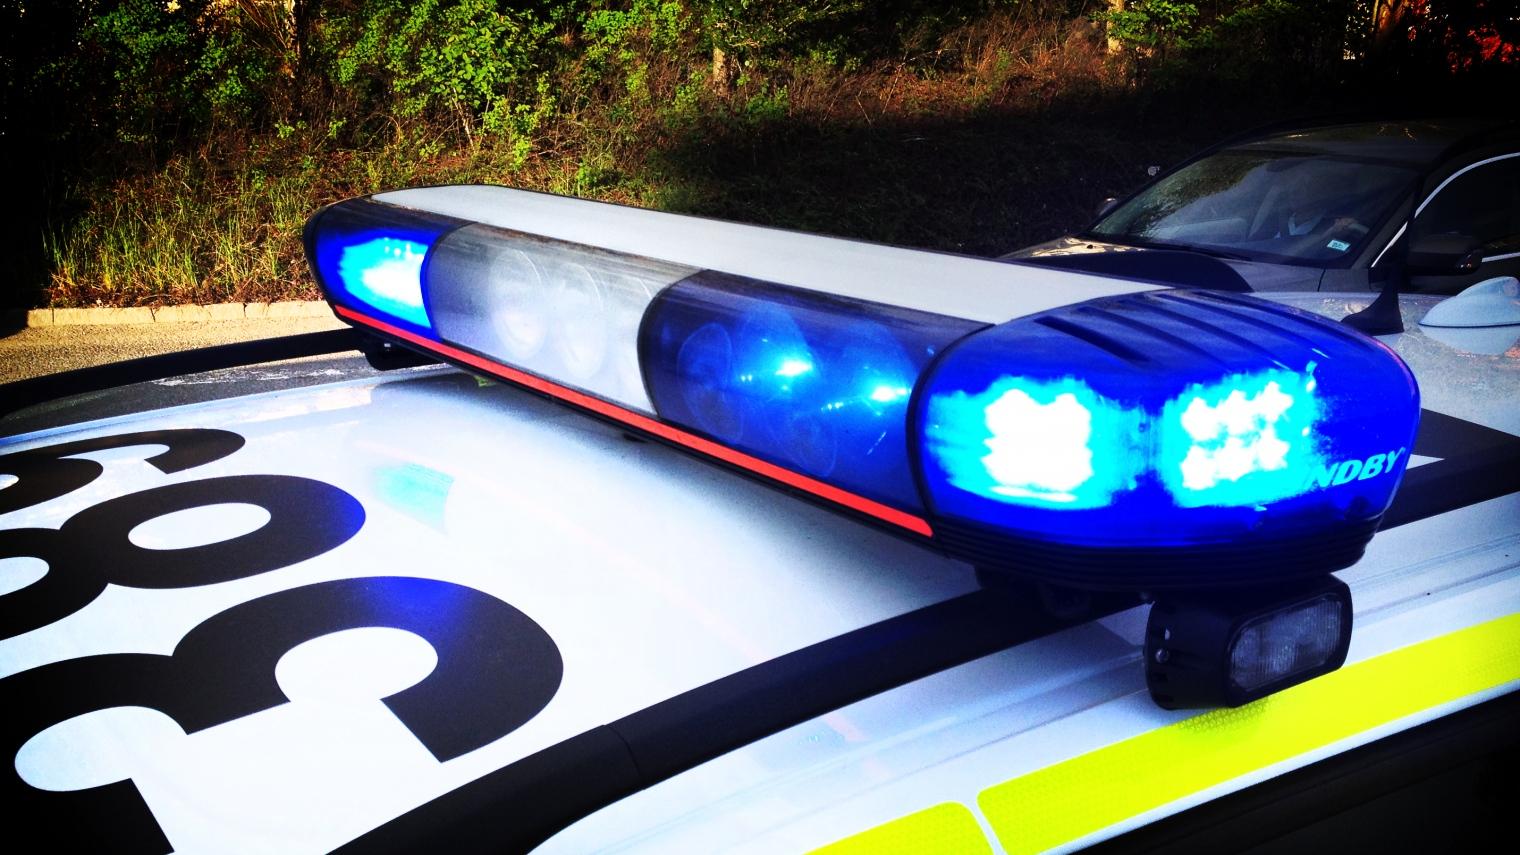 Fonstertittare greps av polis